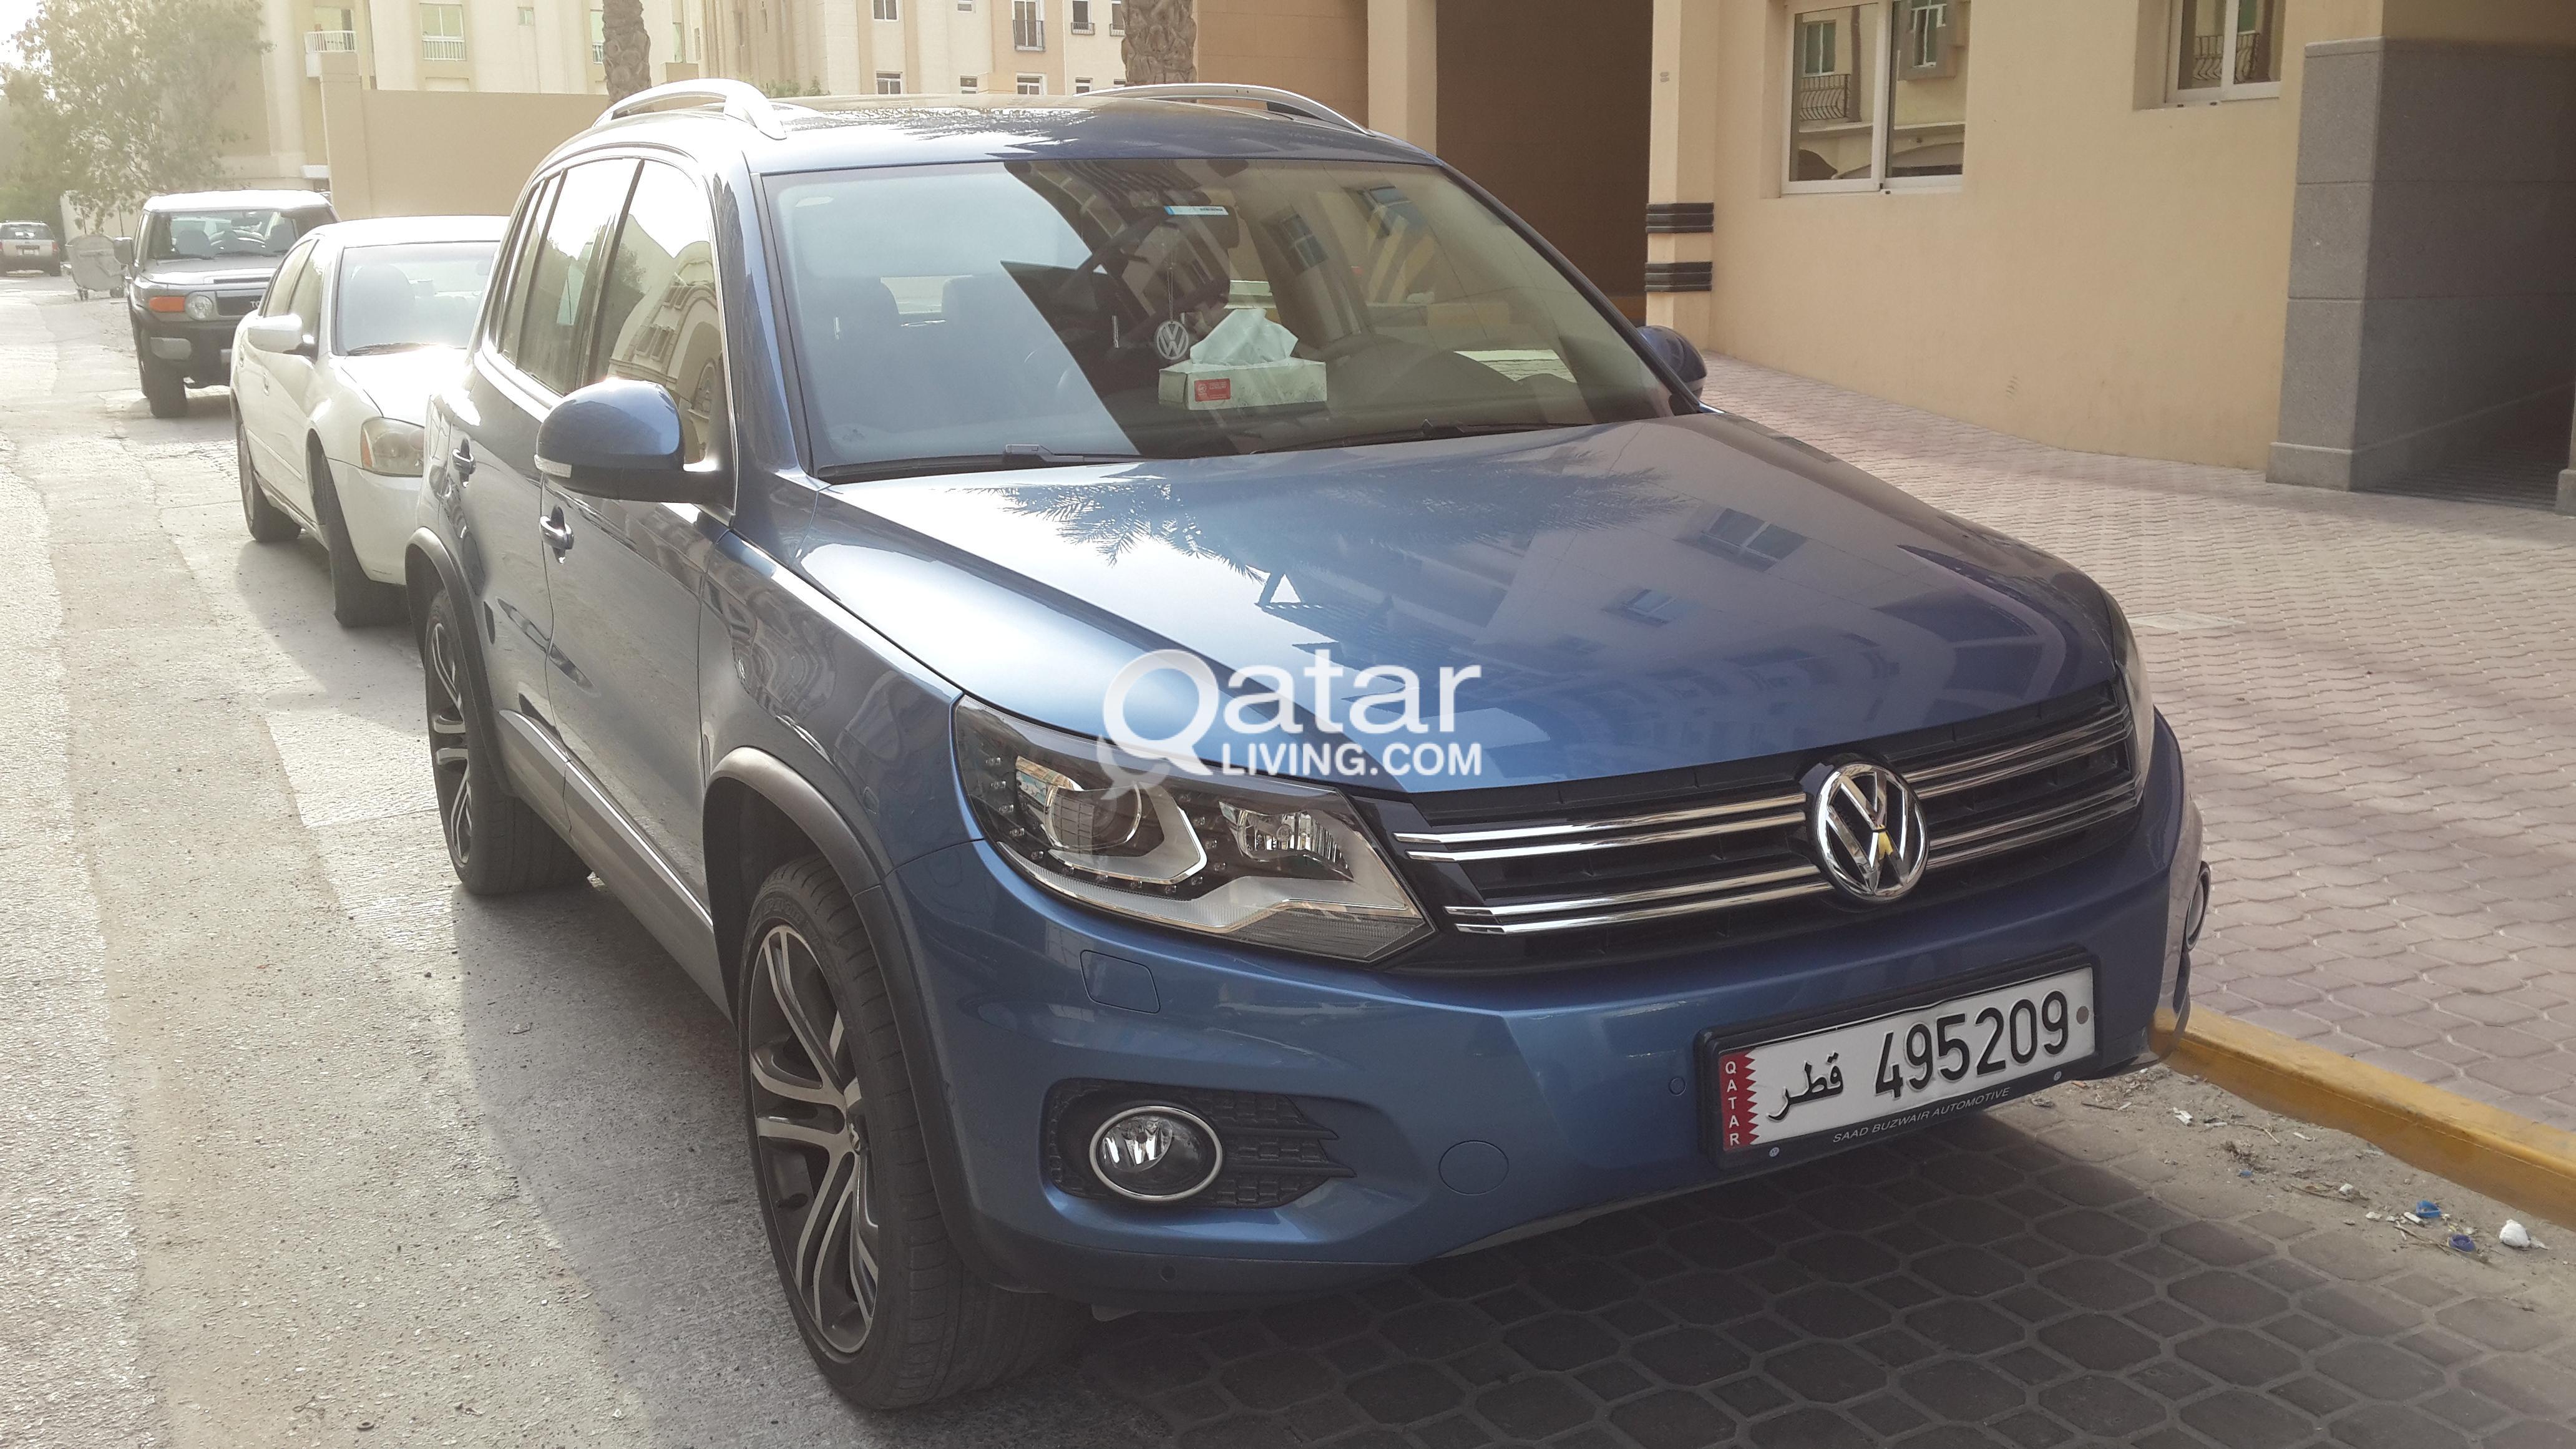 title advert volkswagen sale full for tiguan living information qatar vw option vehicles